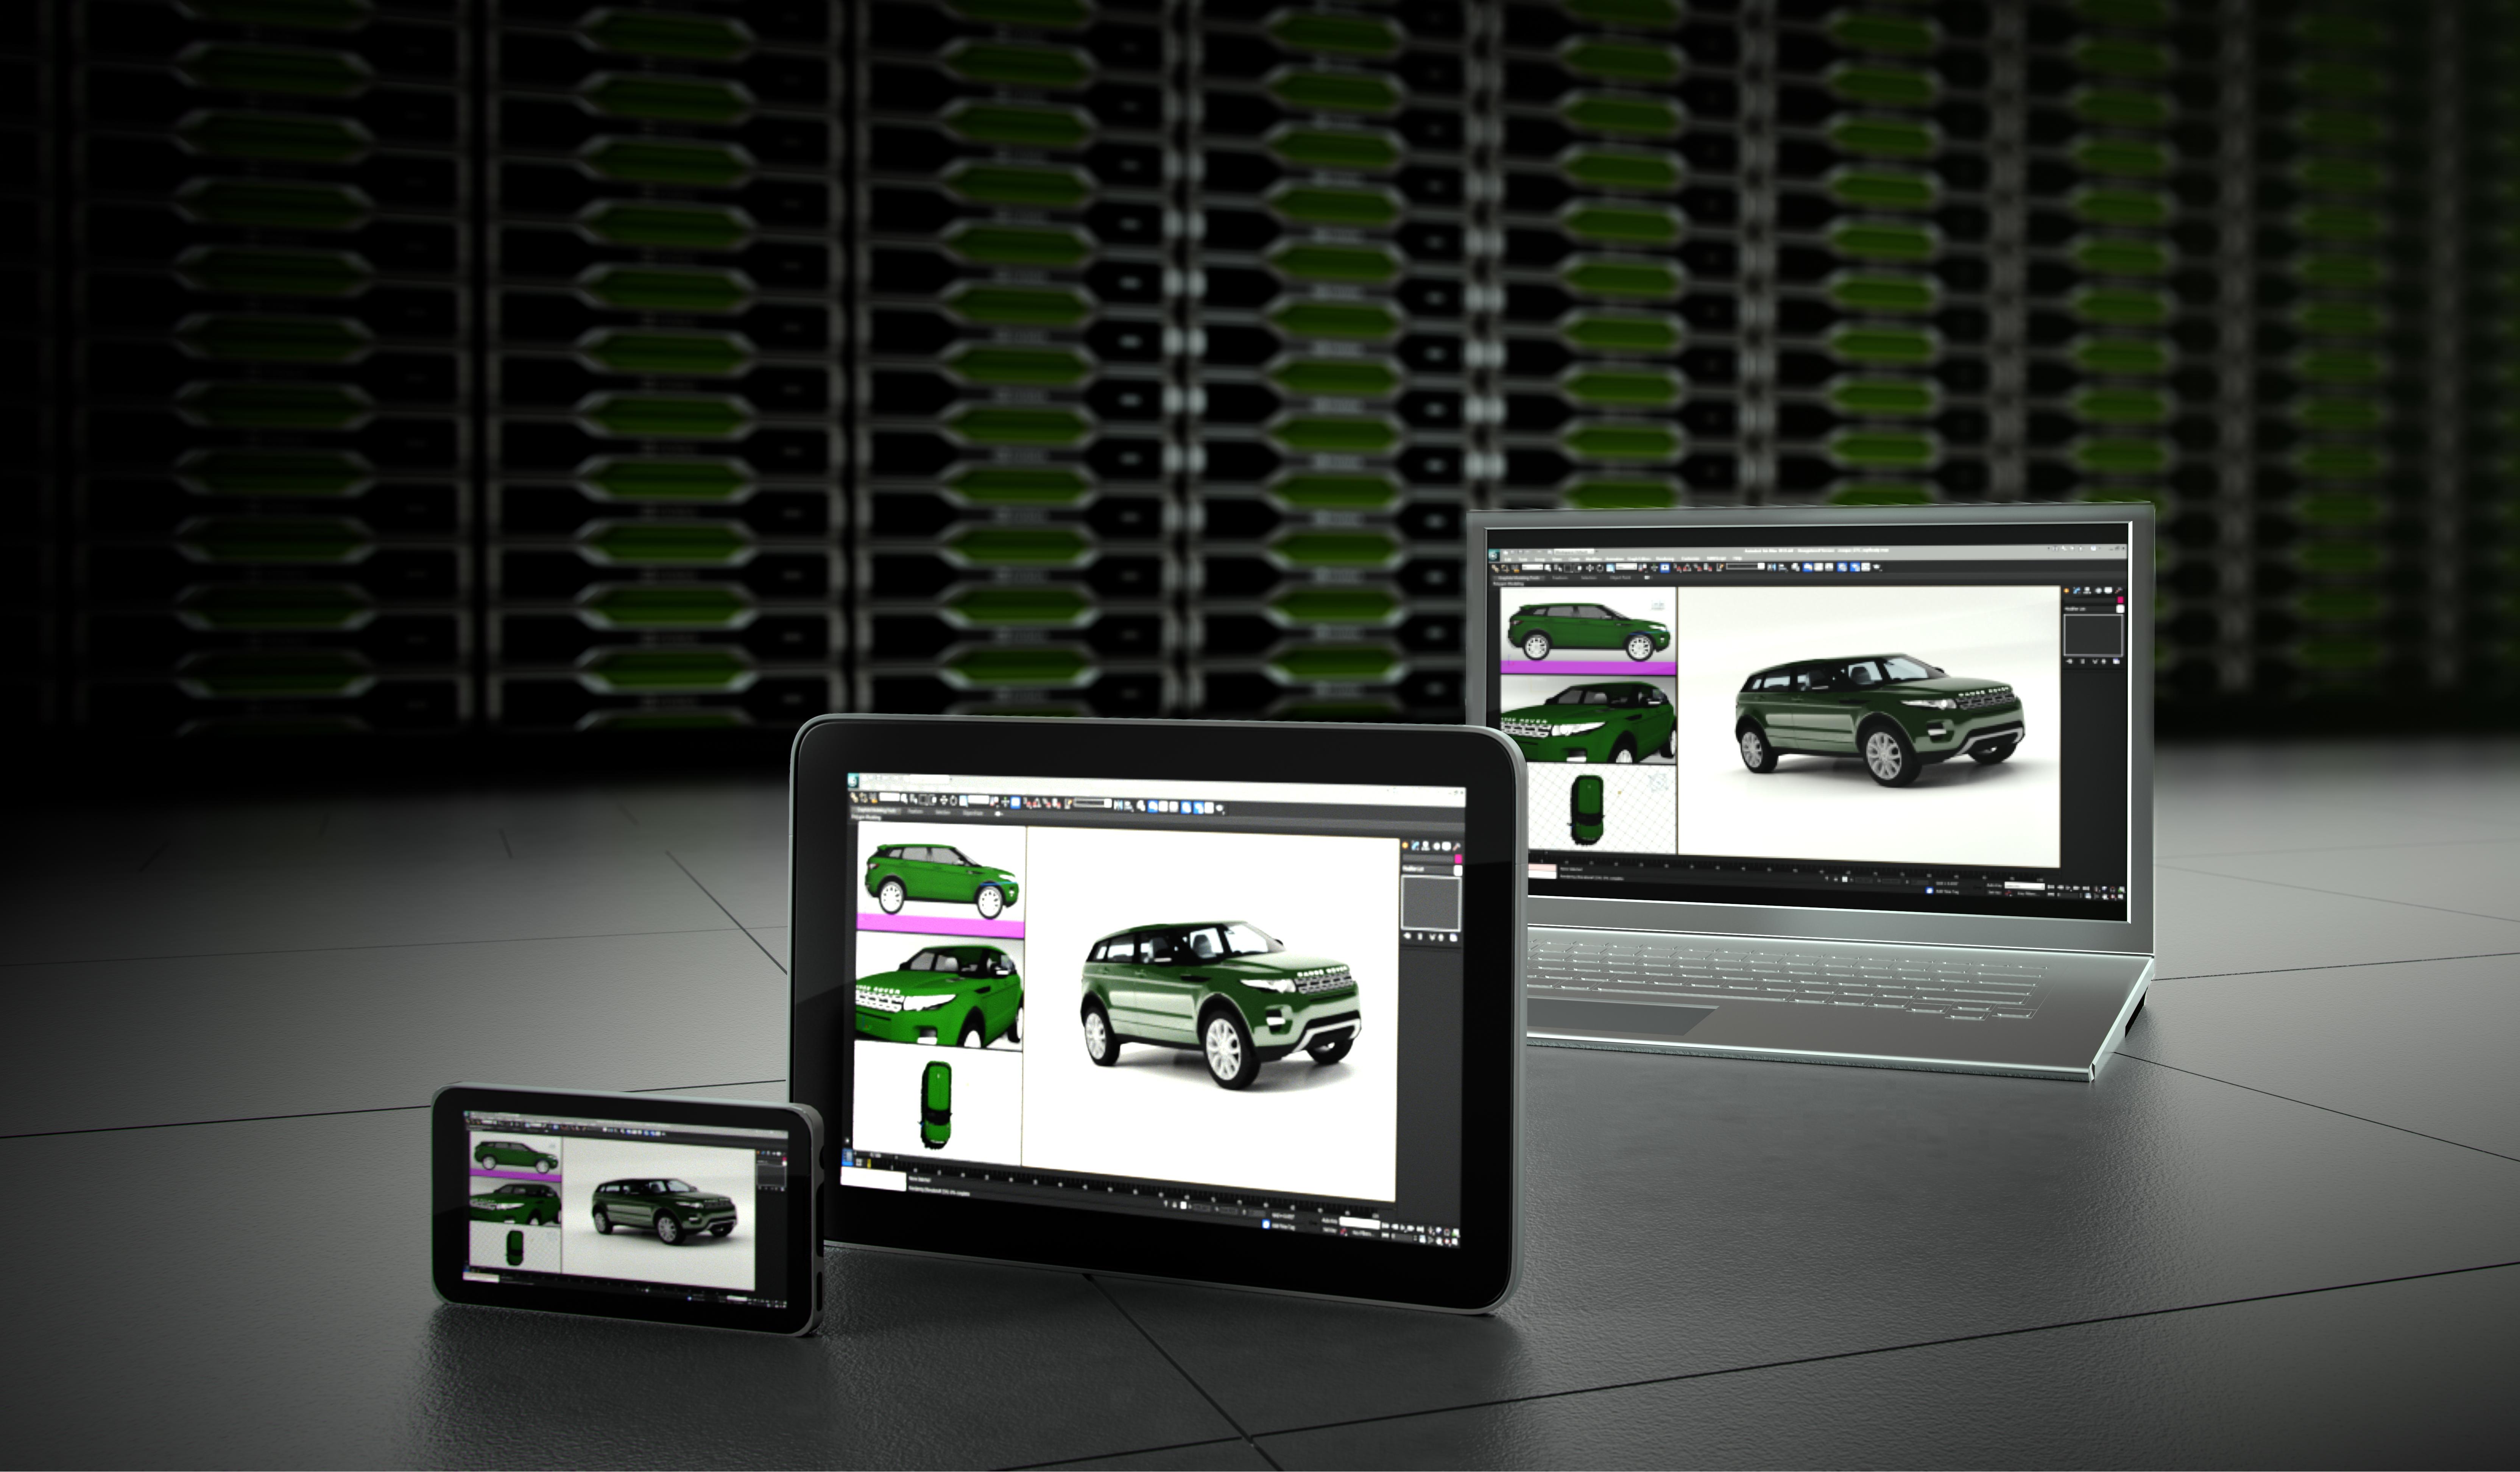 NVIDIA GRID technology for GPU-accelerated virtualization